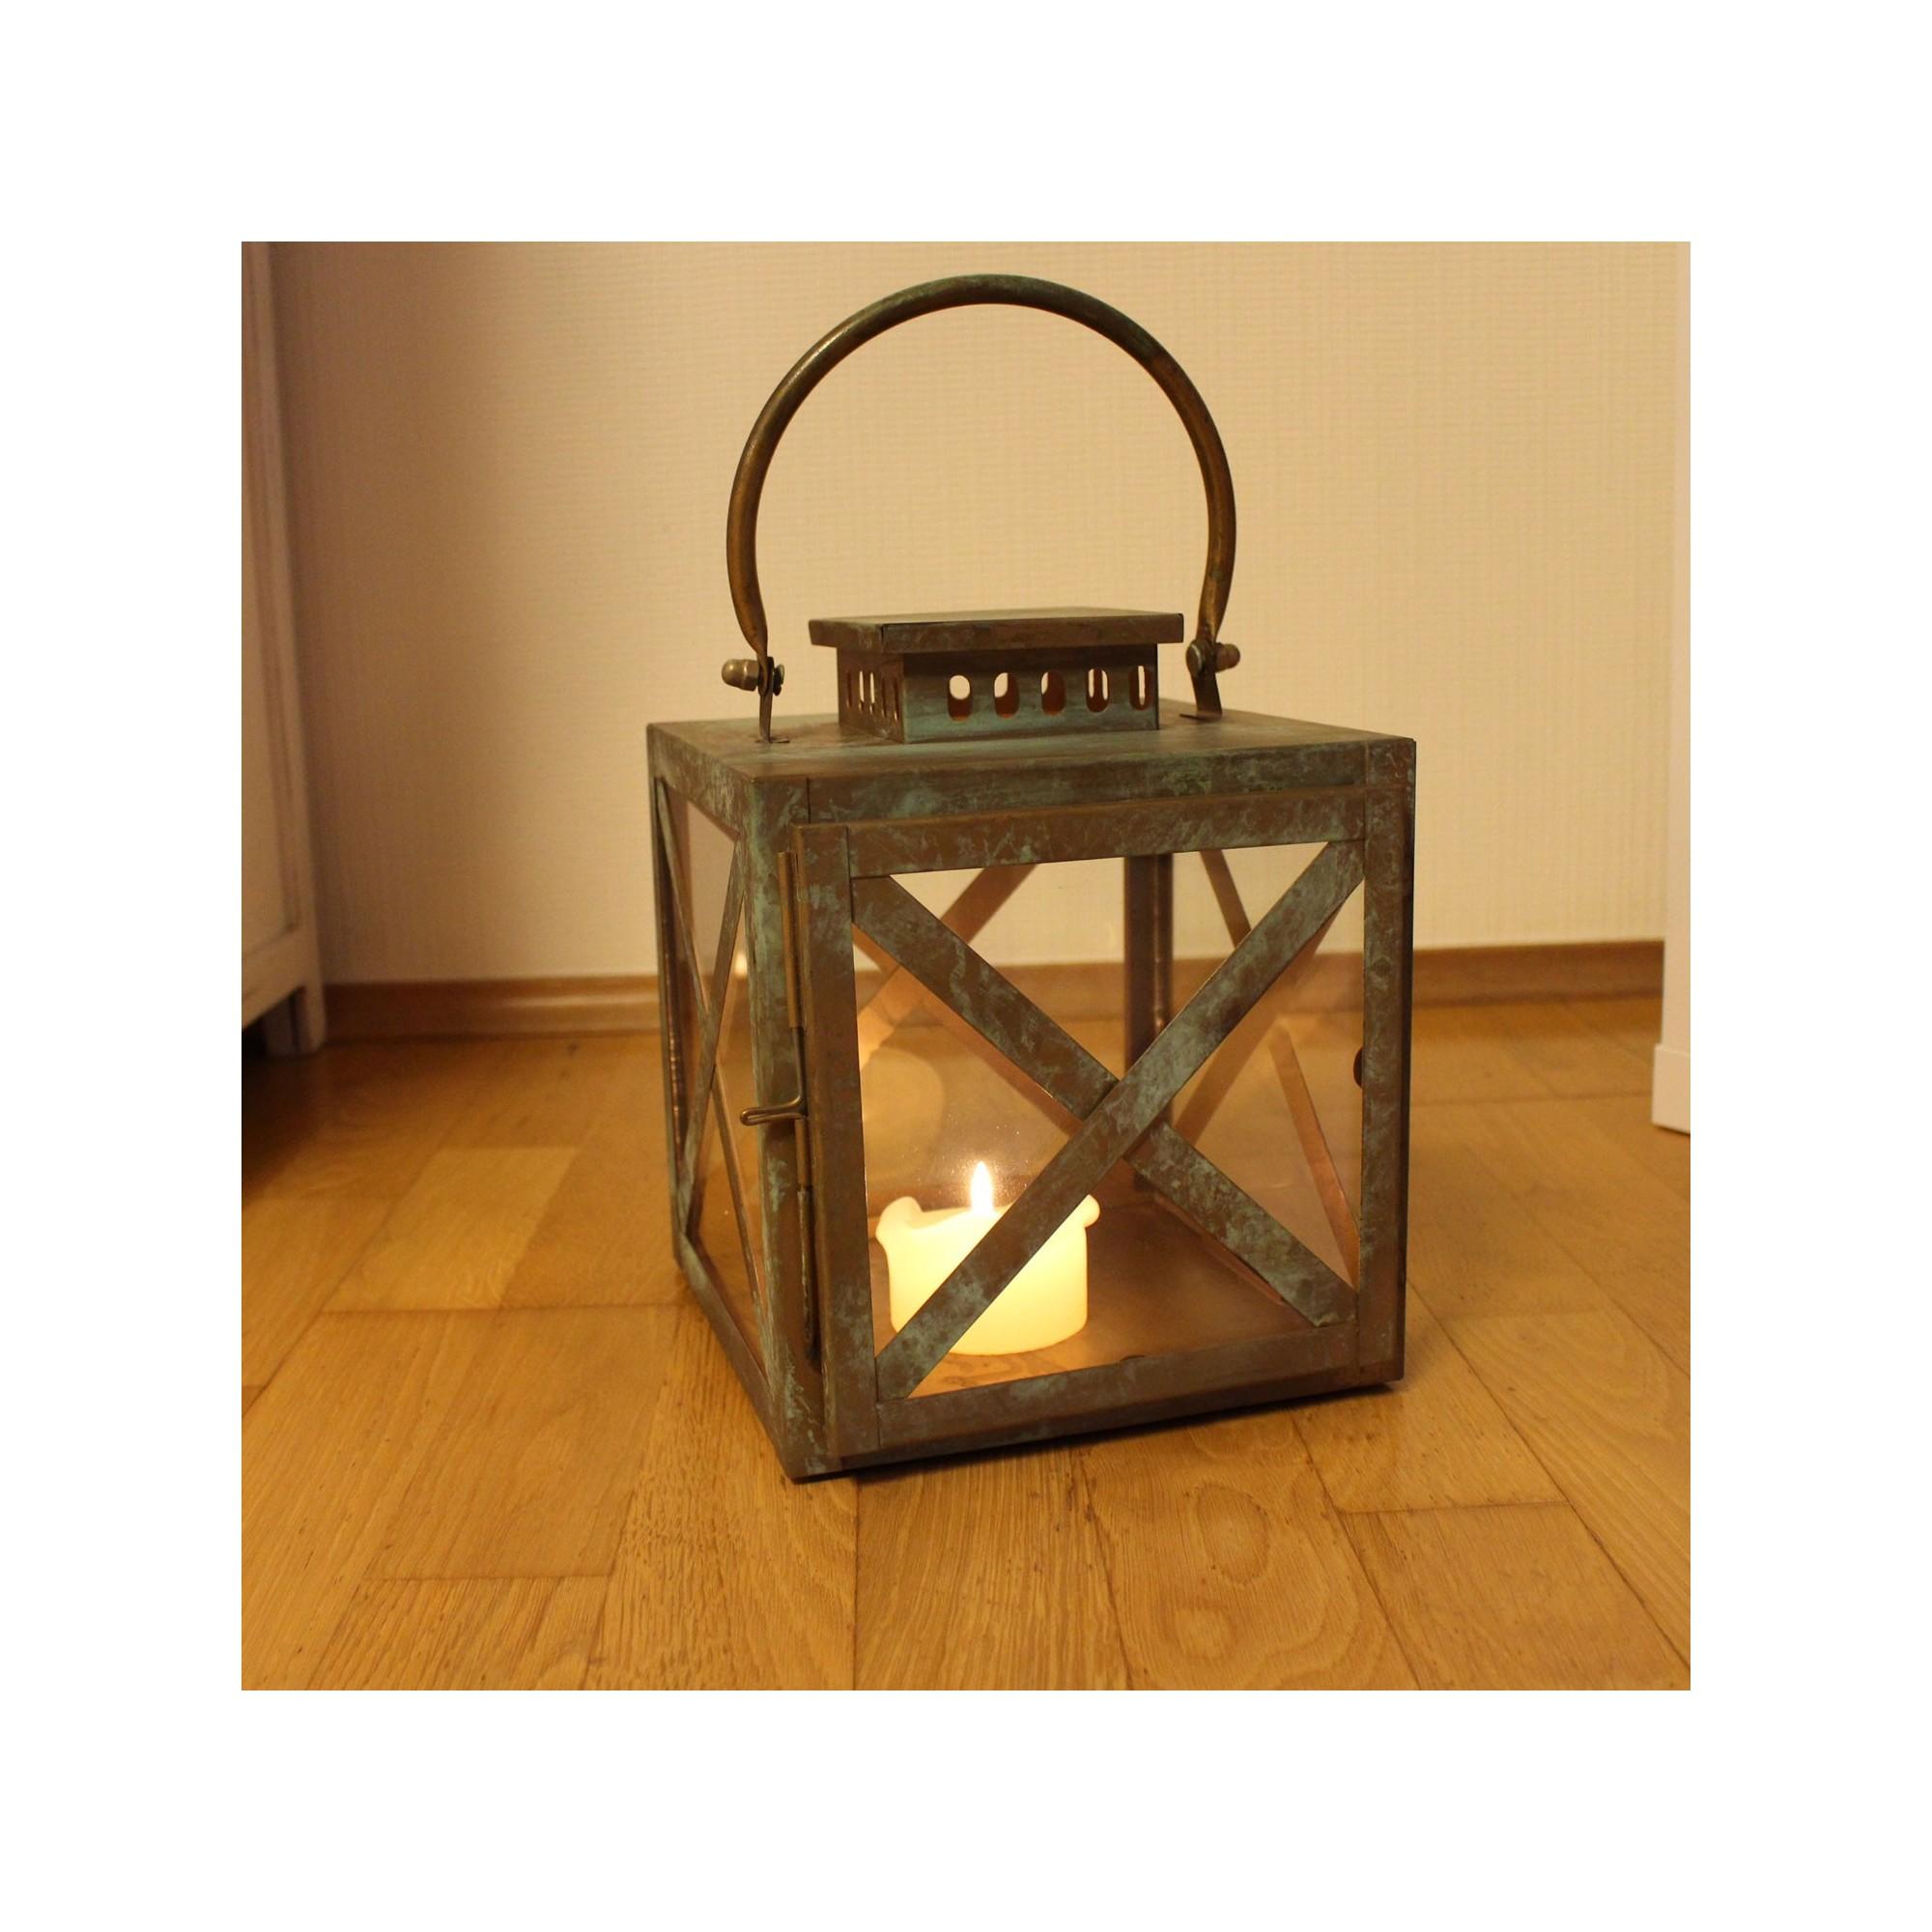 Deko Laterne Quadratisch Aus Metall